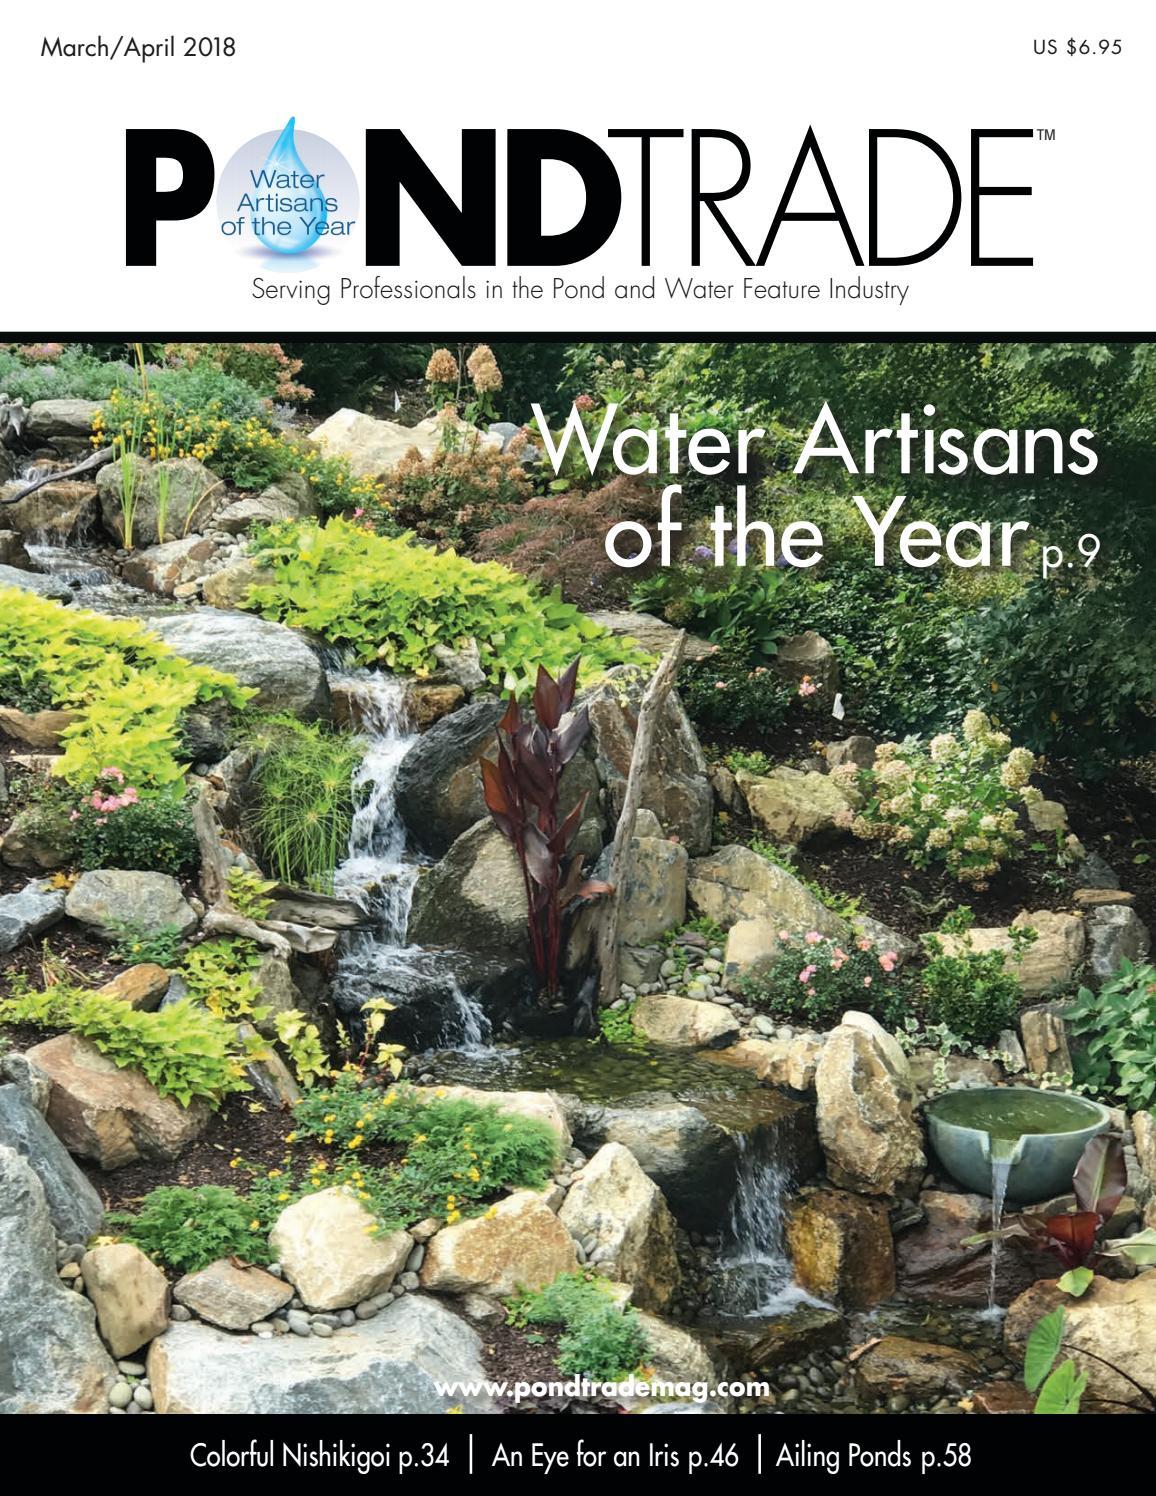 Water Garden FOUTAIN KOI Pond KIT Liner /& Pump 9 X 6 Liner /& 5 Water Lilies